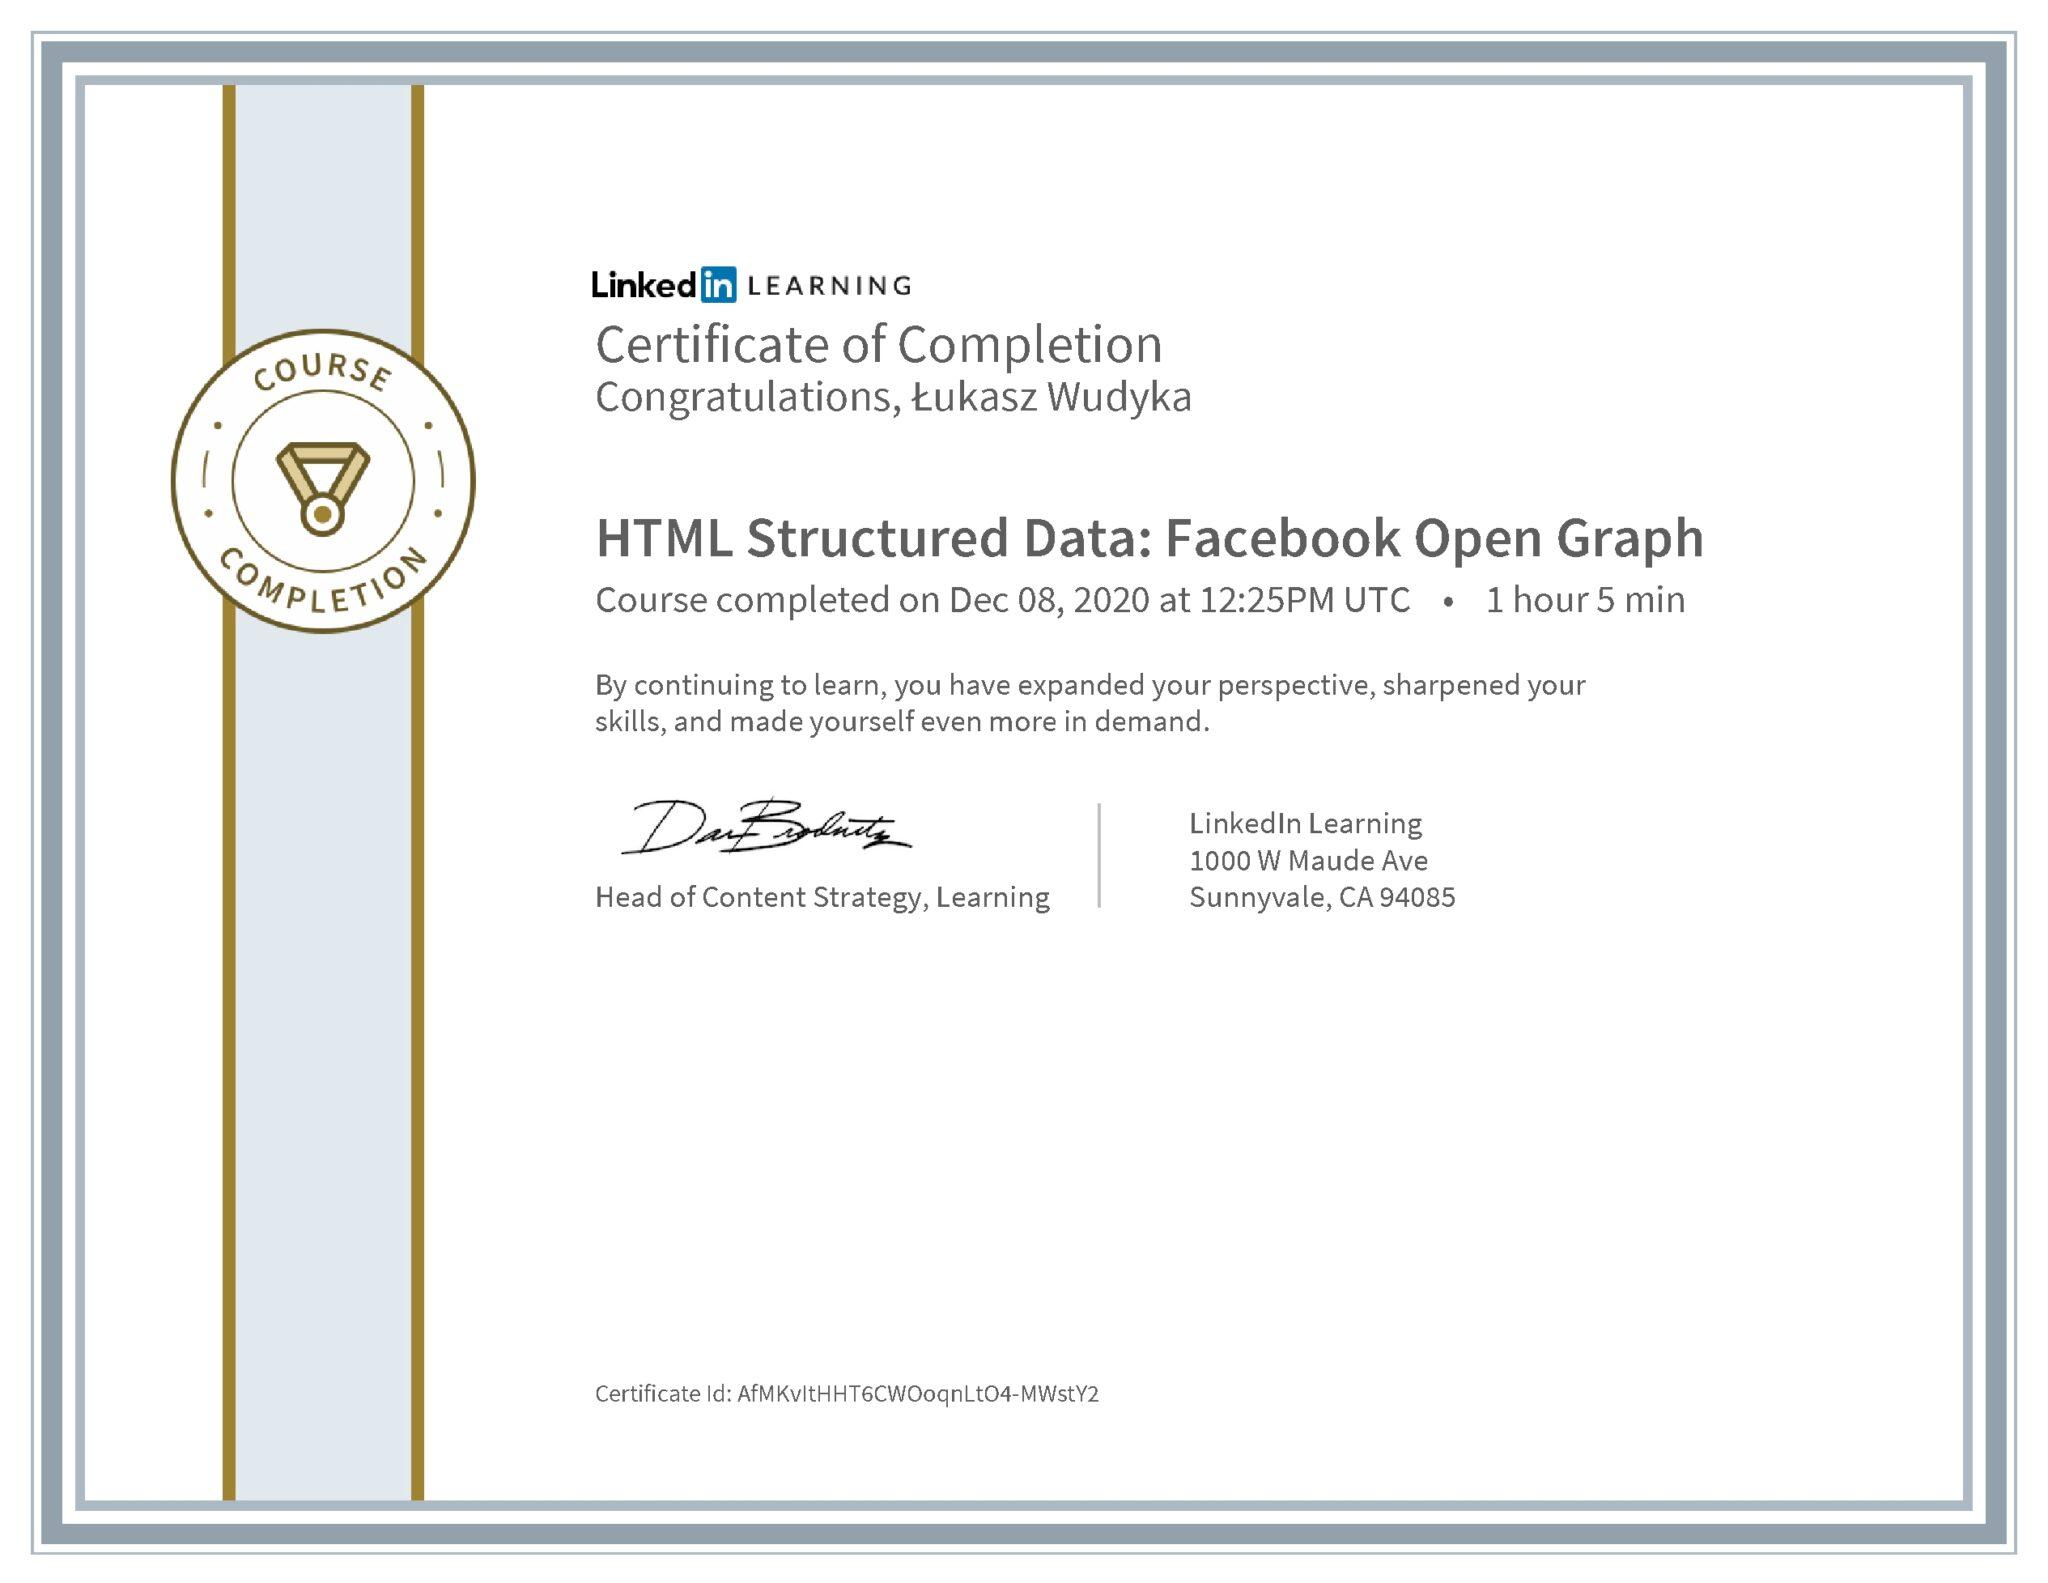 Łukasz Wudyka certyfikat LinkedIn HTML Structured Data: Facebook Open Graph